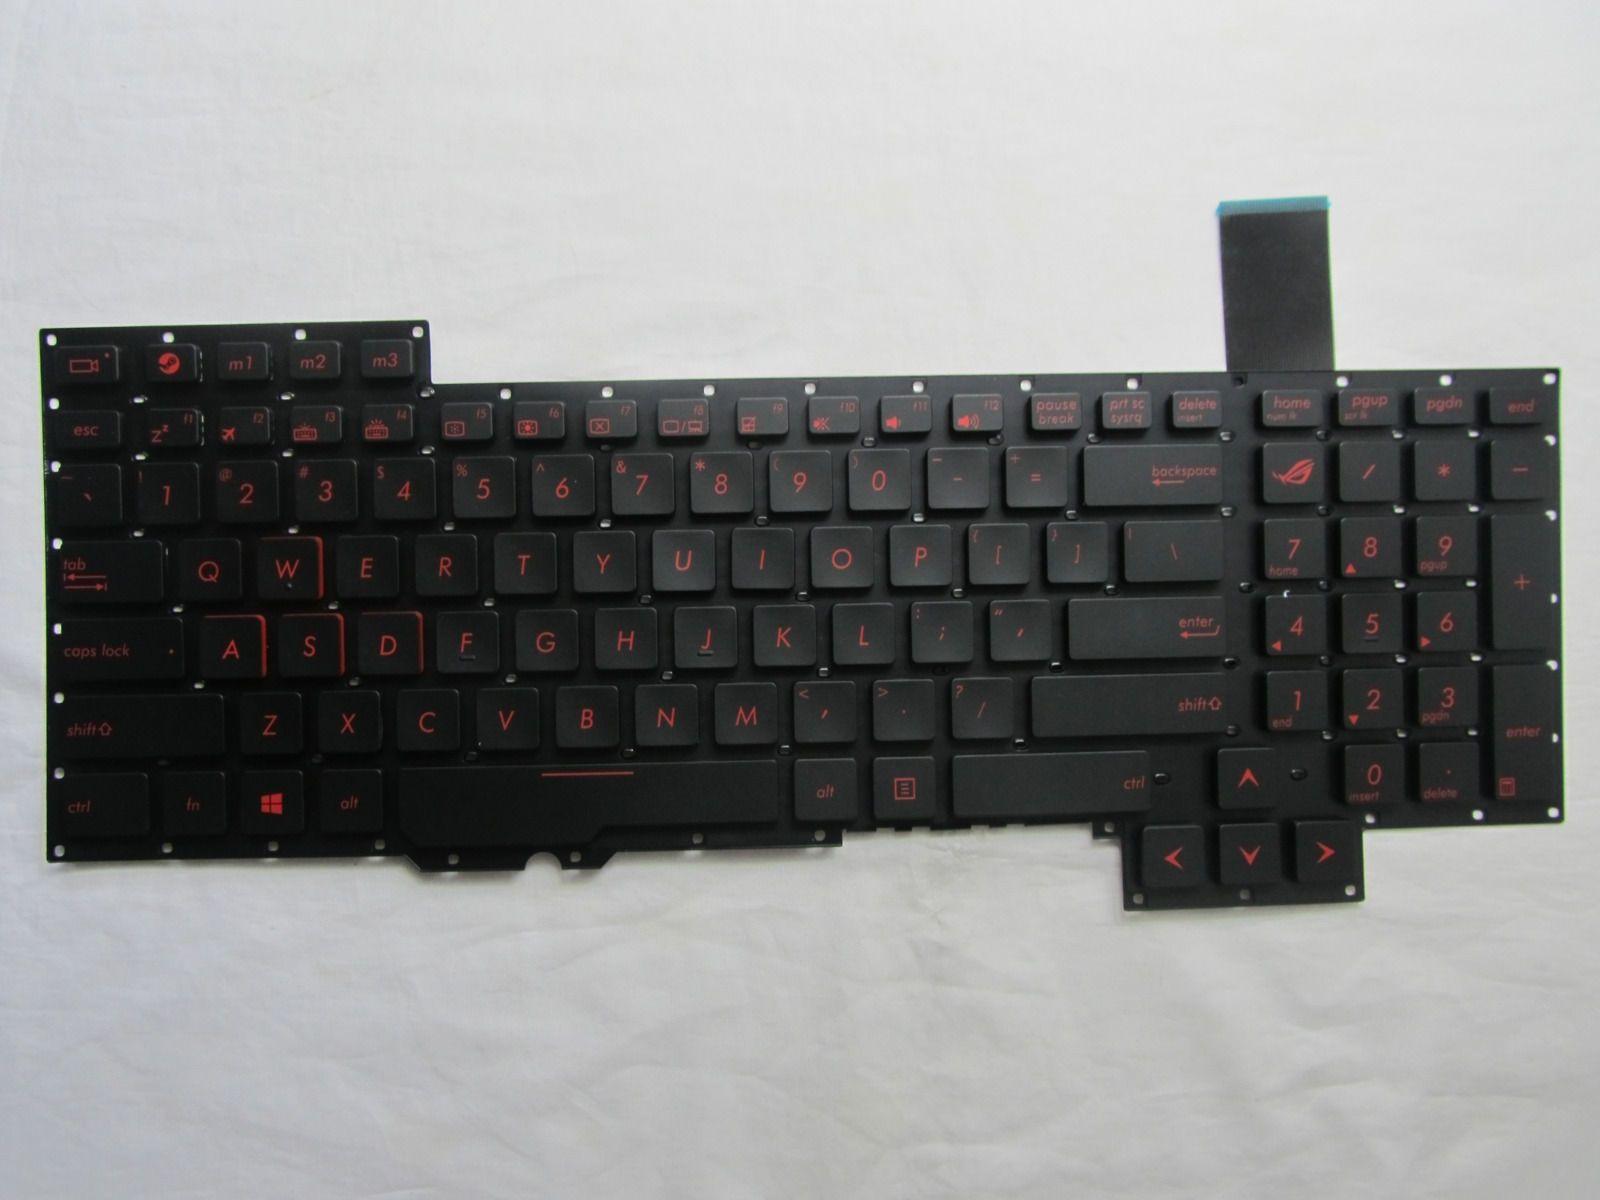 Original New For Asus G751 G751j G751jl G751jm G751jt G751jy Us Black Laptop Keyboard Laptop Accessories Laptop Keyboard Laptop